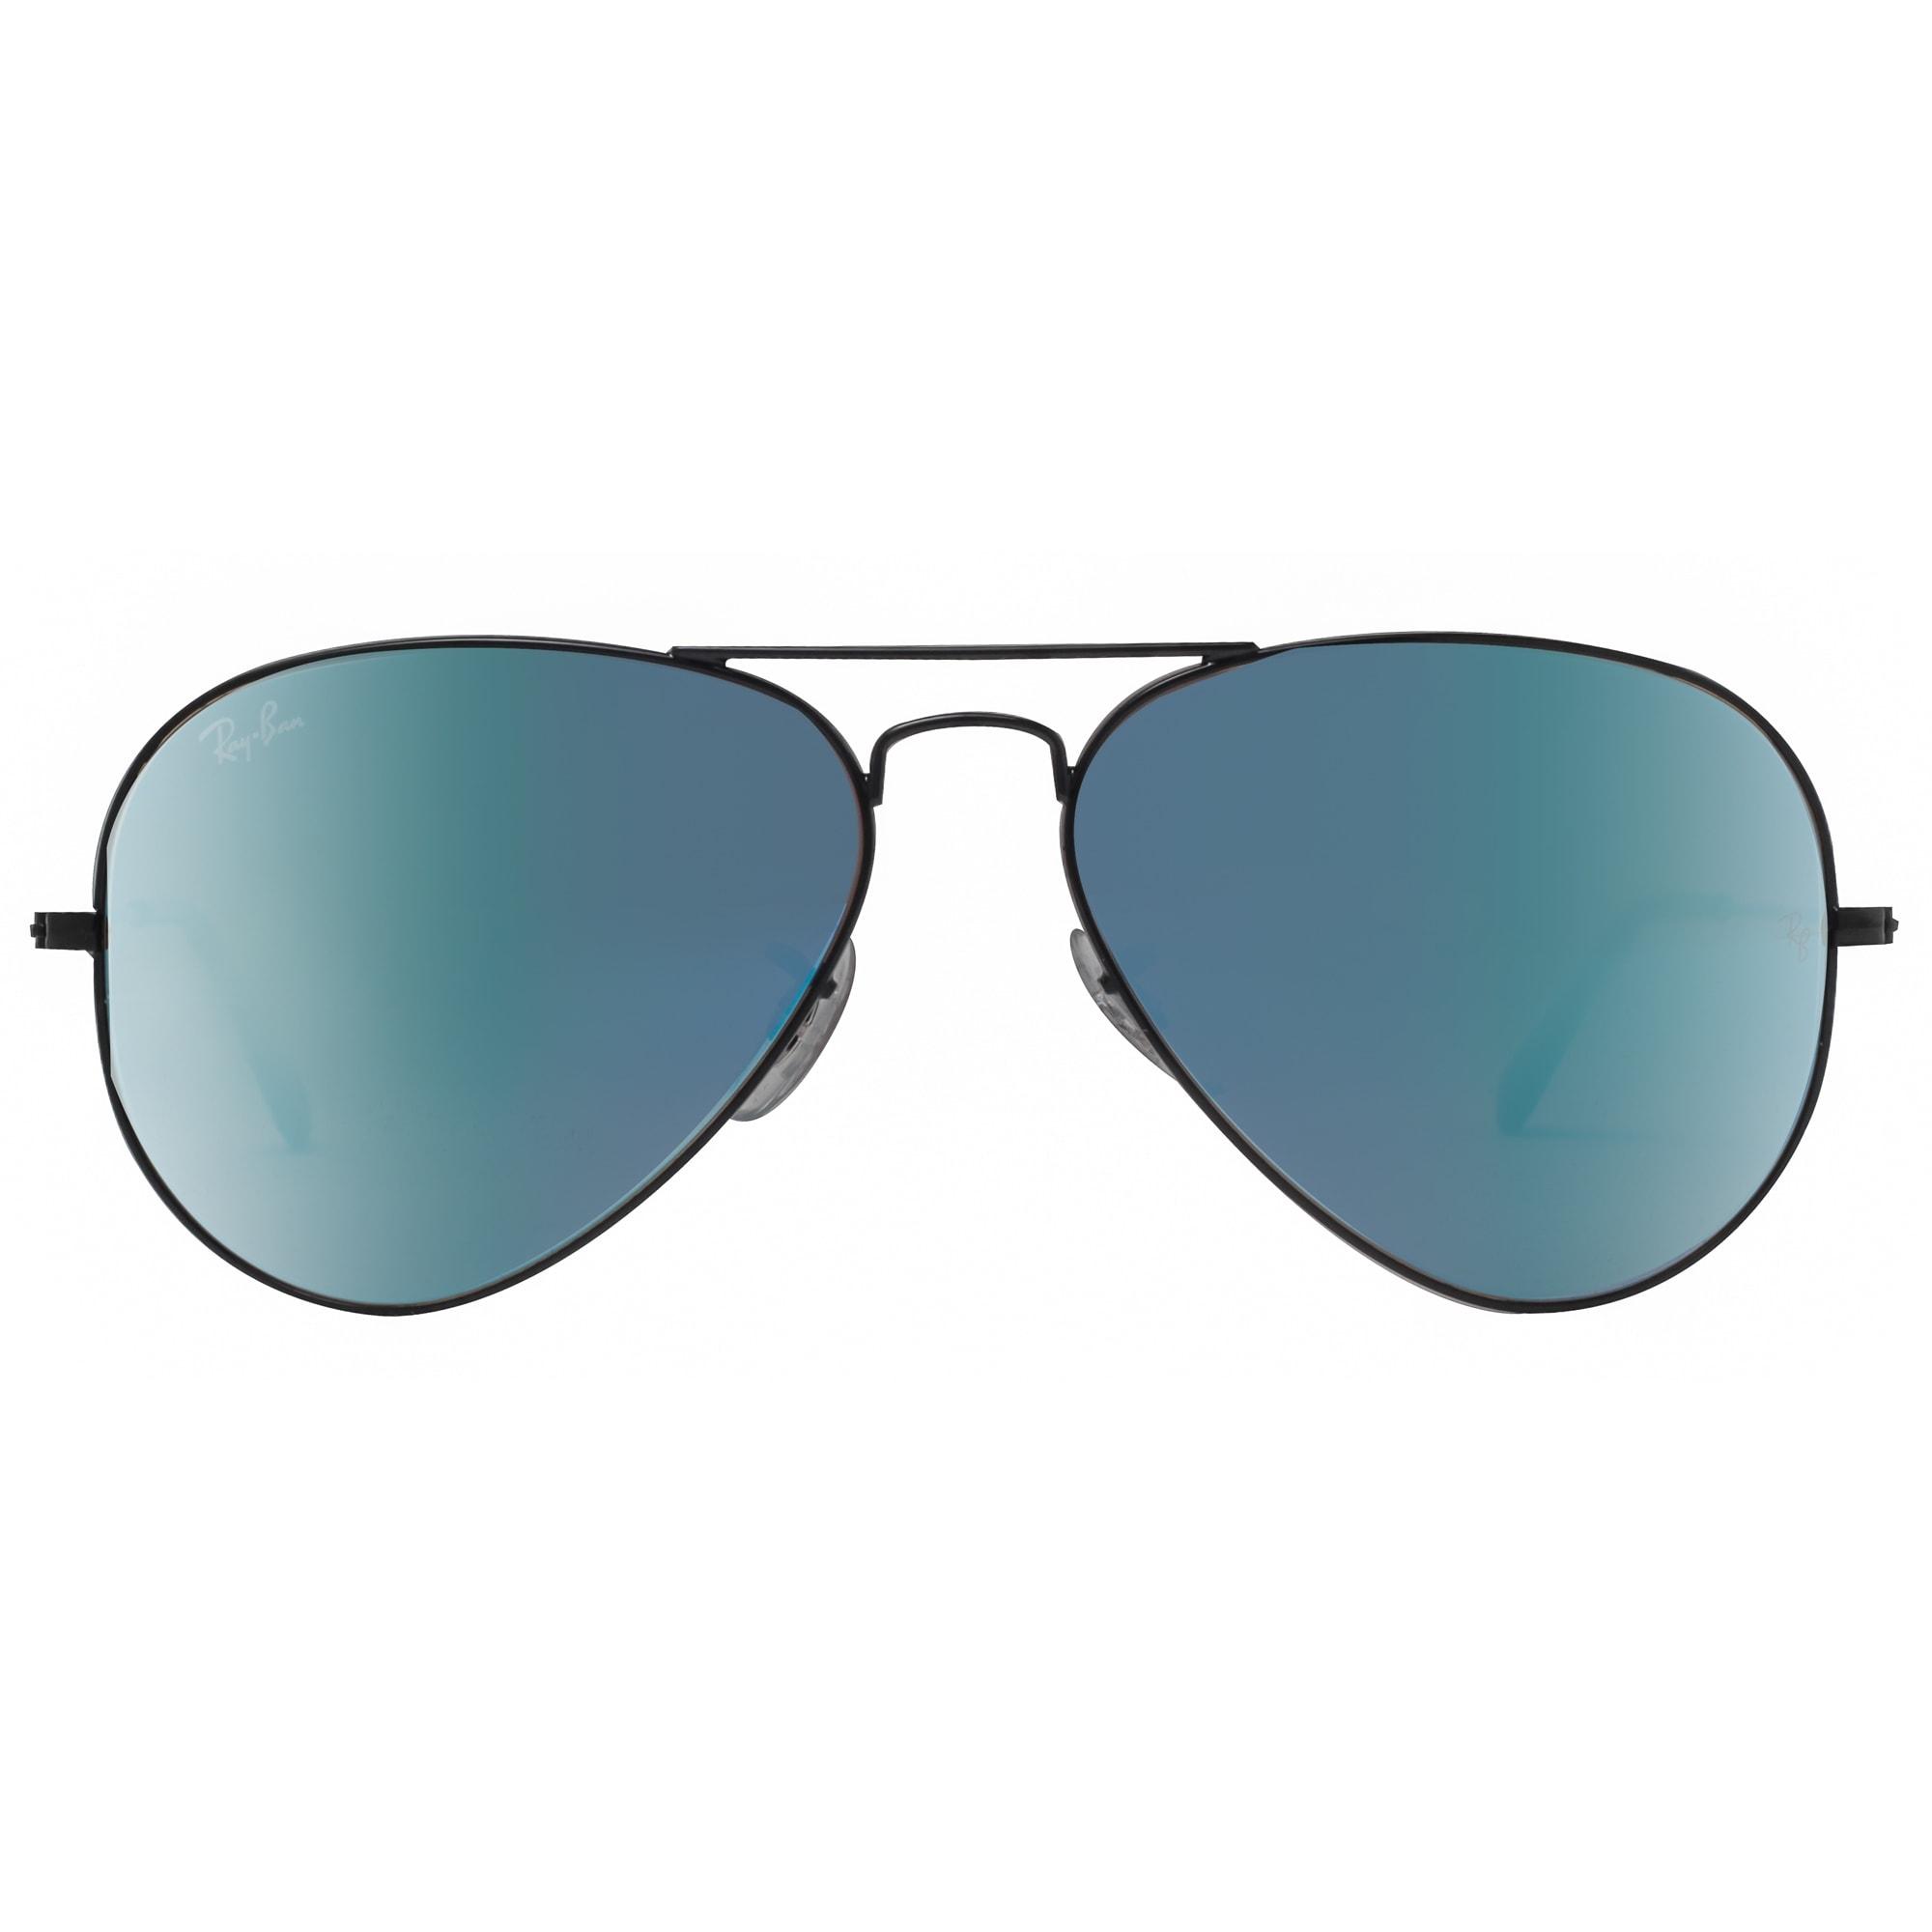 81eb6e08bdca2 Shop Ray Ban RB3025 002 4O 58mm Black Blue Gradient Flash Aviator Sunglasses  - 58mm-14mm-135mm - Free Shipping Today - Overstock.com - 18794051